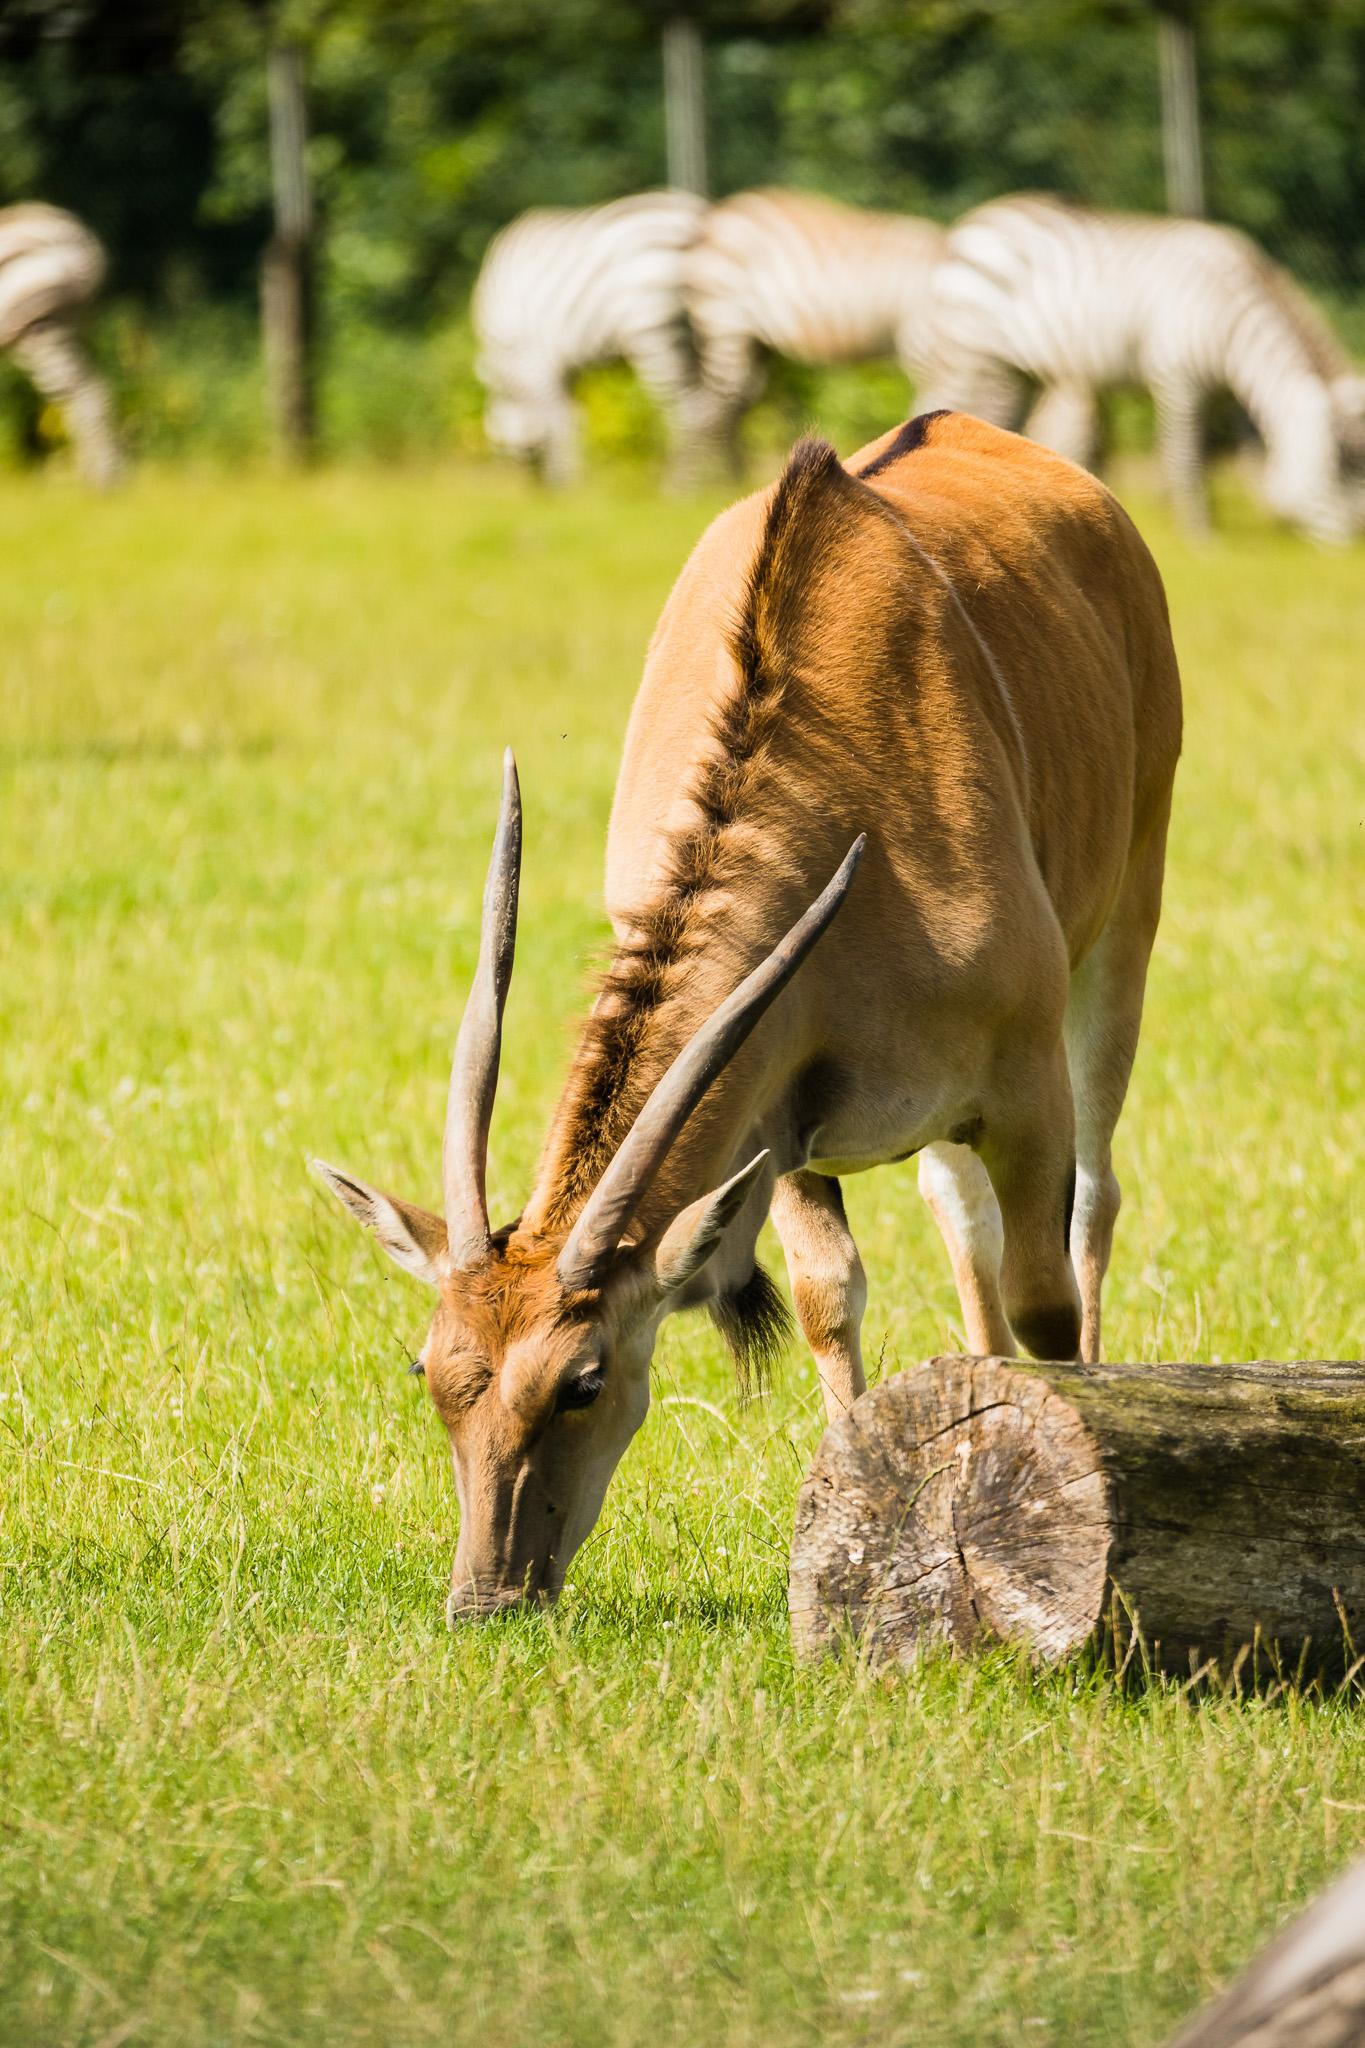 Givskud-Zoo-Safari-NorthernWorkshops-9.jpg